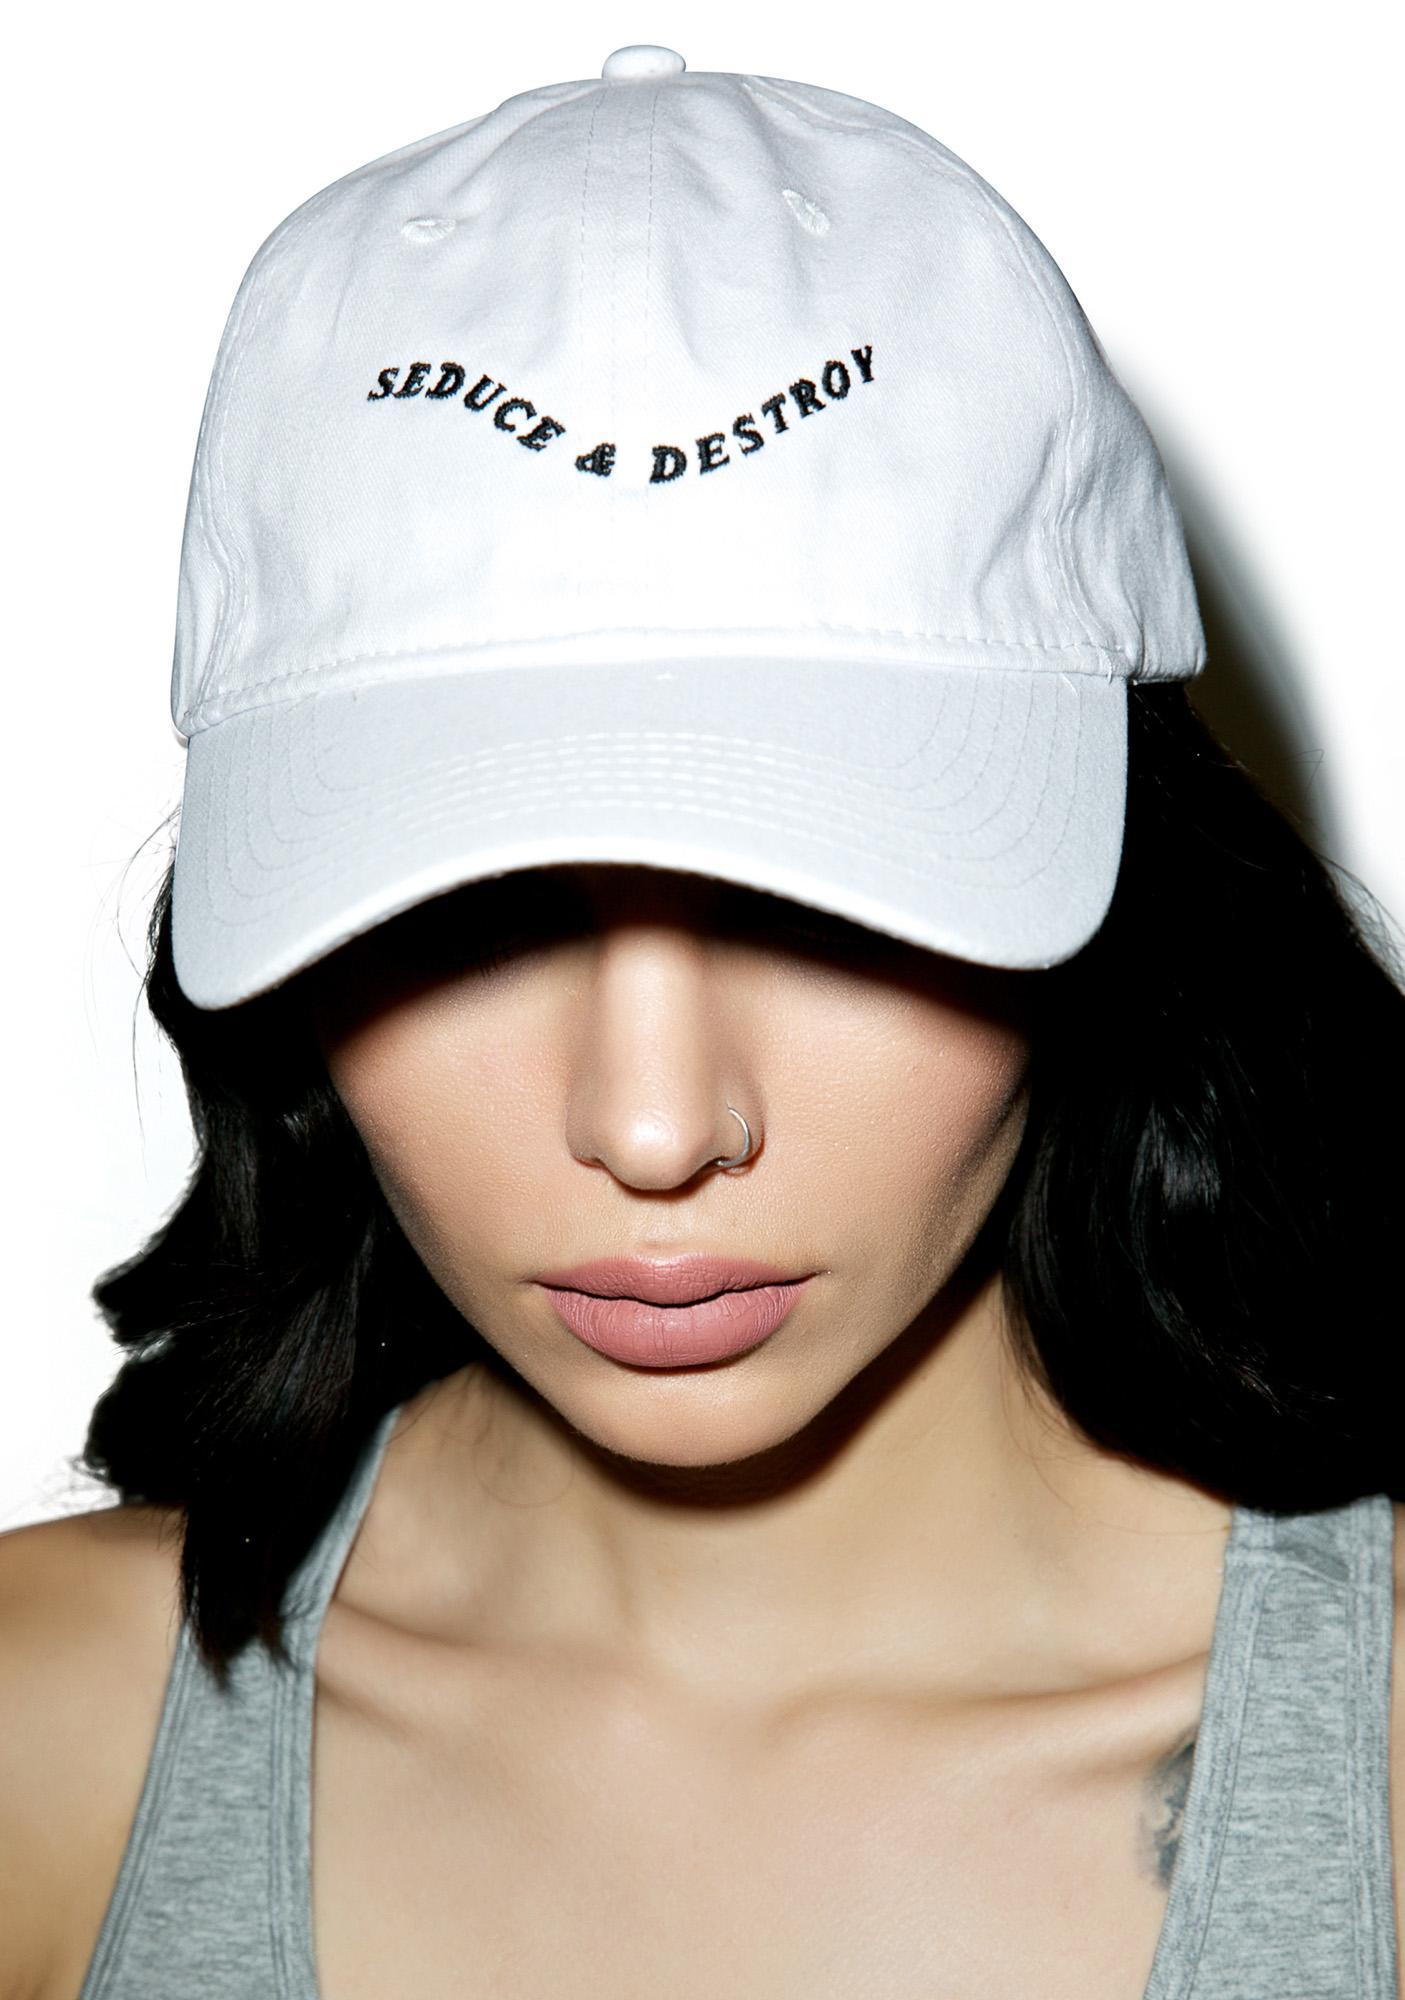 Dimepiece Seduce & Destroy Cap